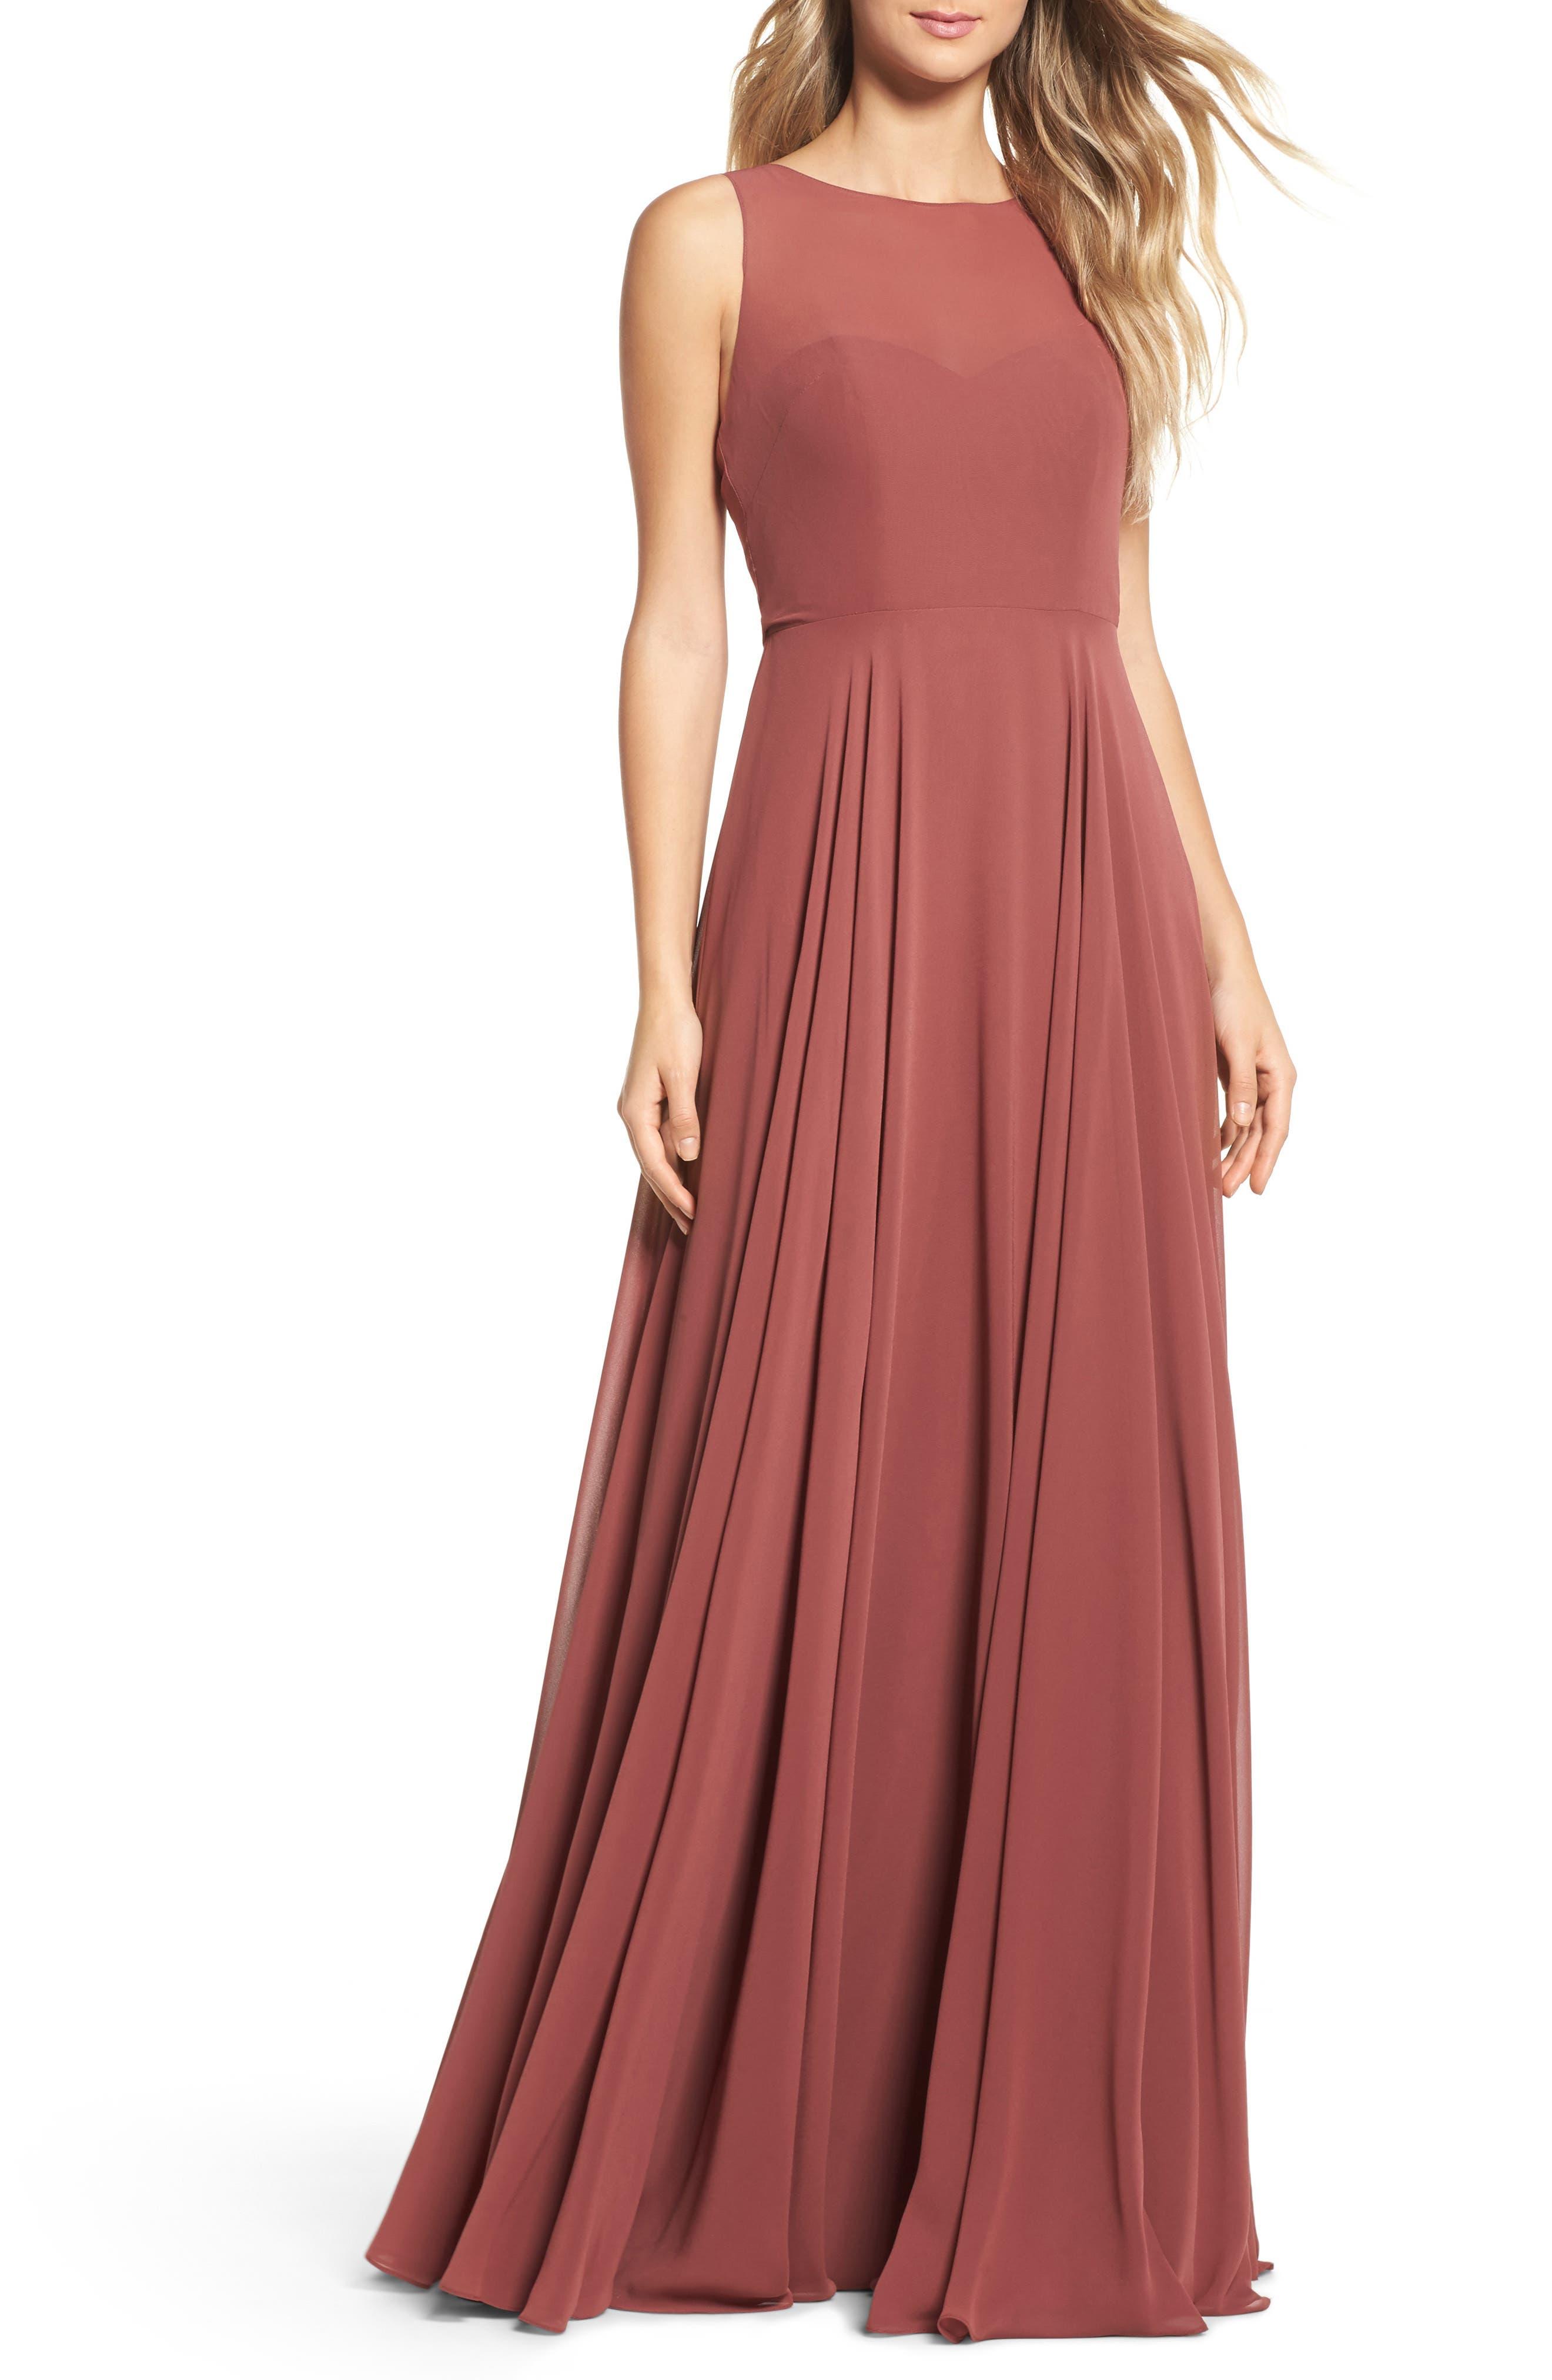 Alternate Image 1 Selected - Jenny Yoo Elizabeth Chiffon Gown